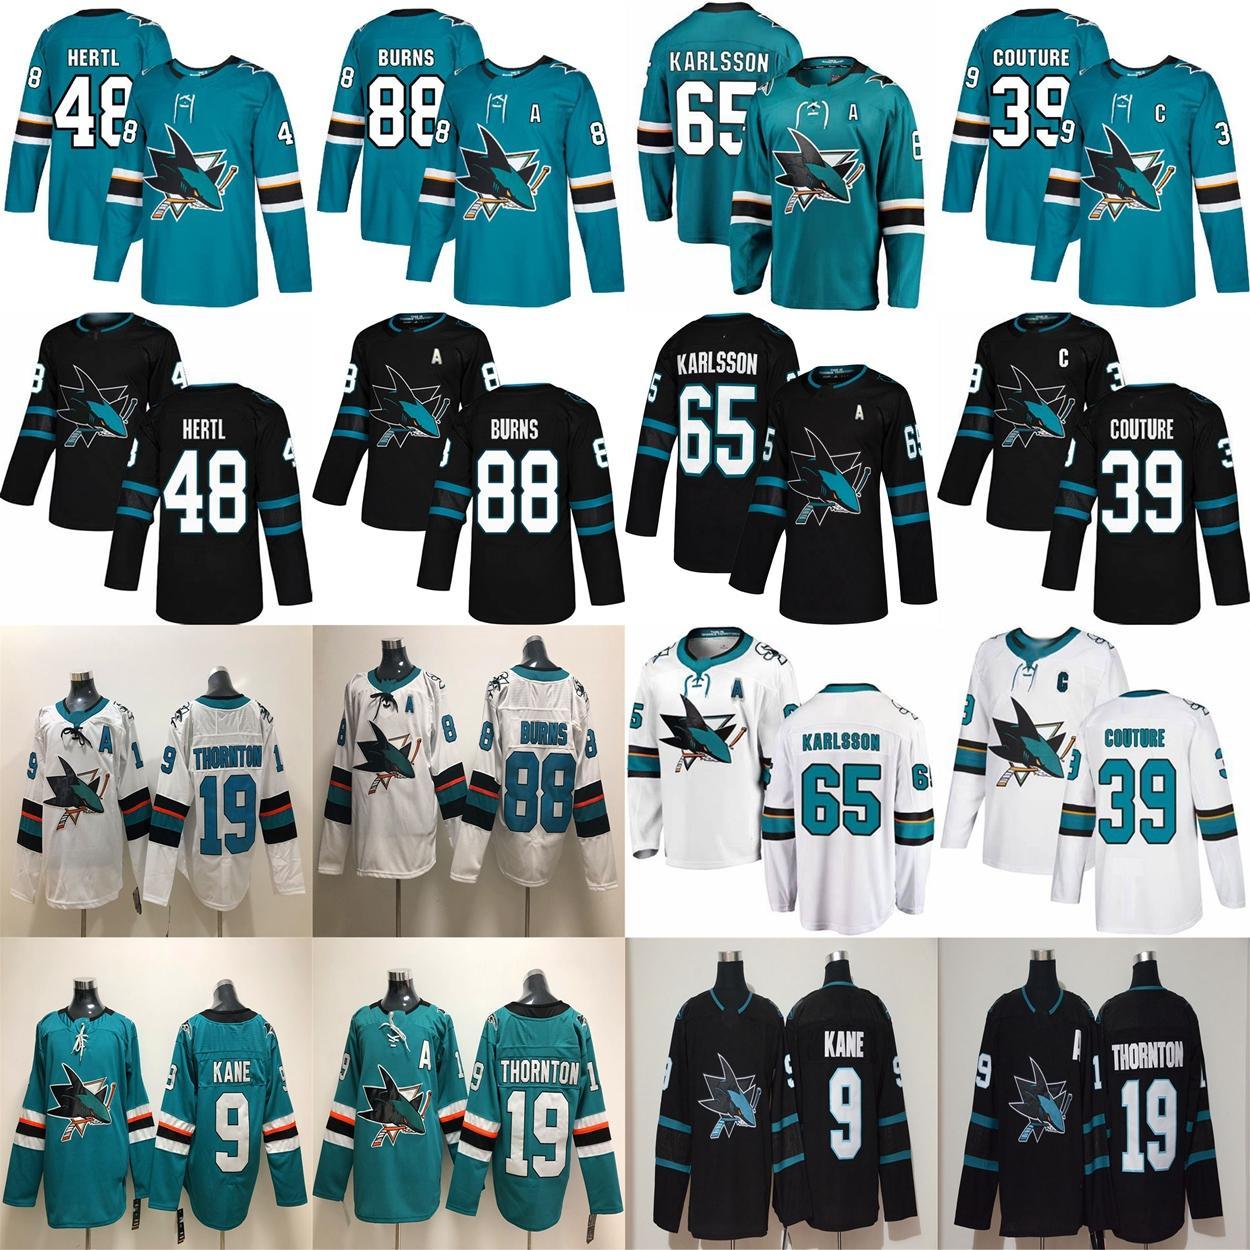 San Jose Sharks Jerseys 9 Evander Kane Jersey 88 Brent Burns 65 Erik Karlsson 39 Logan Couture 19 Jerseys de hockey Joe Thornton cousu